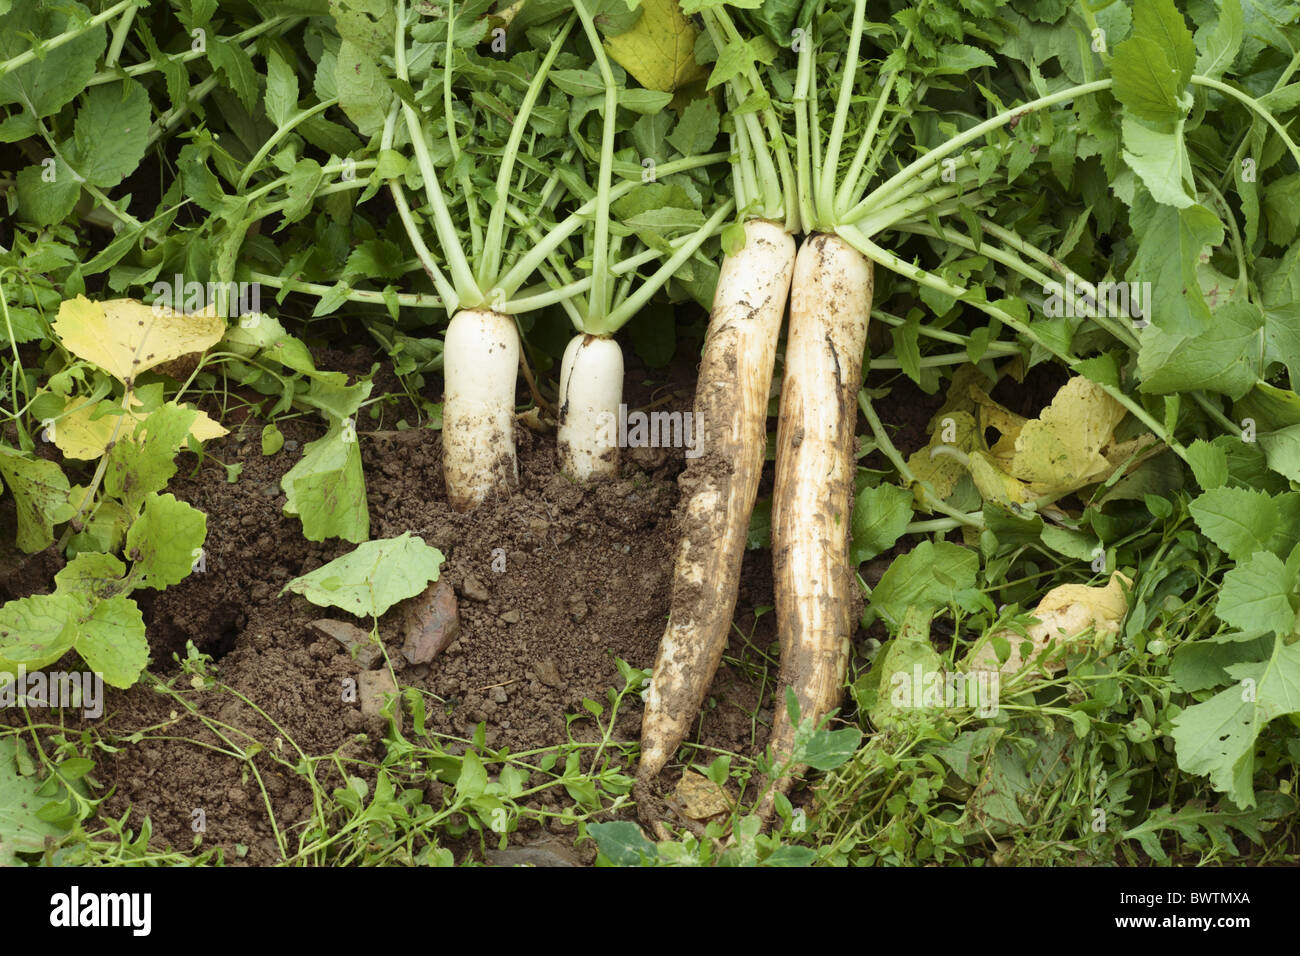 Raphanus sativus mooli radish winter daikon root vegetable white chinese nature natural environment environmental Stock Photo